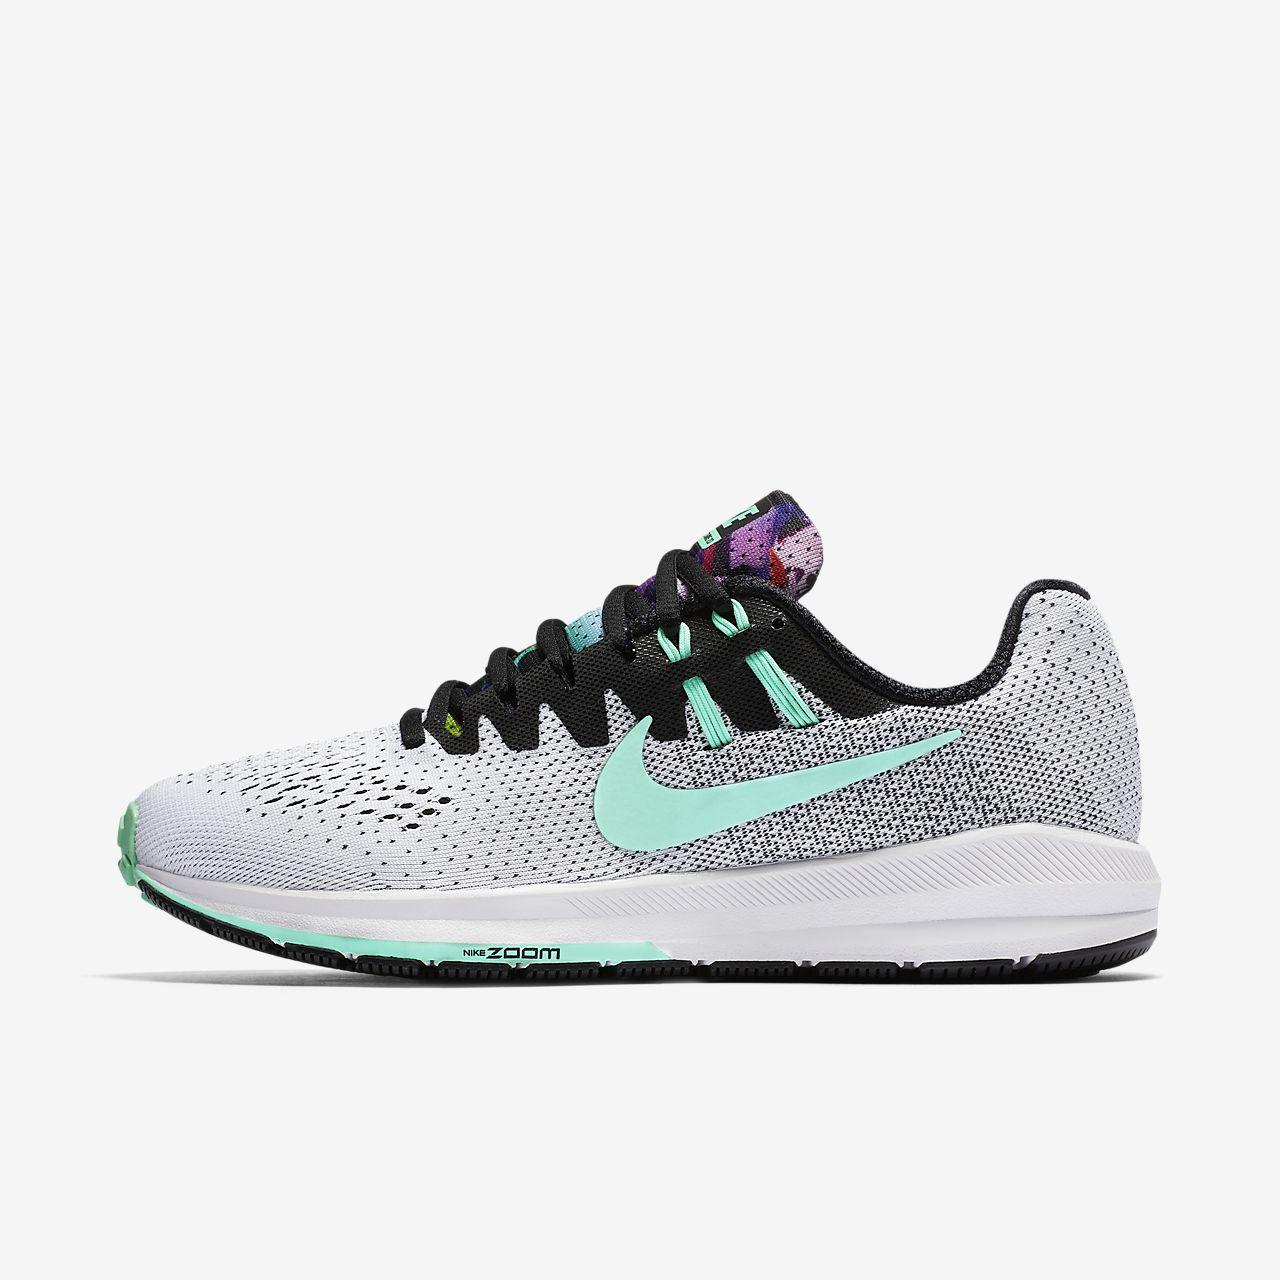 Free Run 2017 Solstice - Chaussures - Bas-tops Et Baskets Nike 4g1nR19n